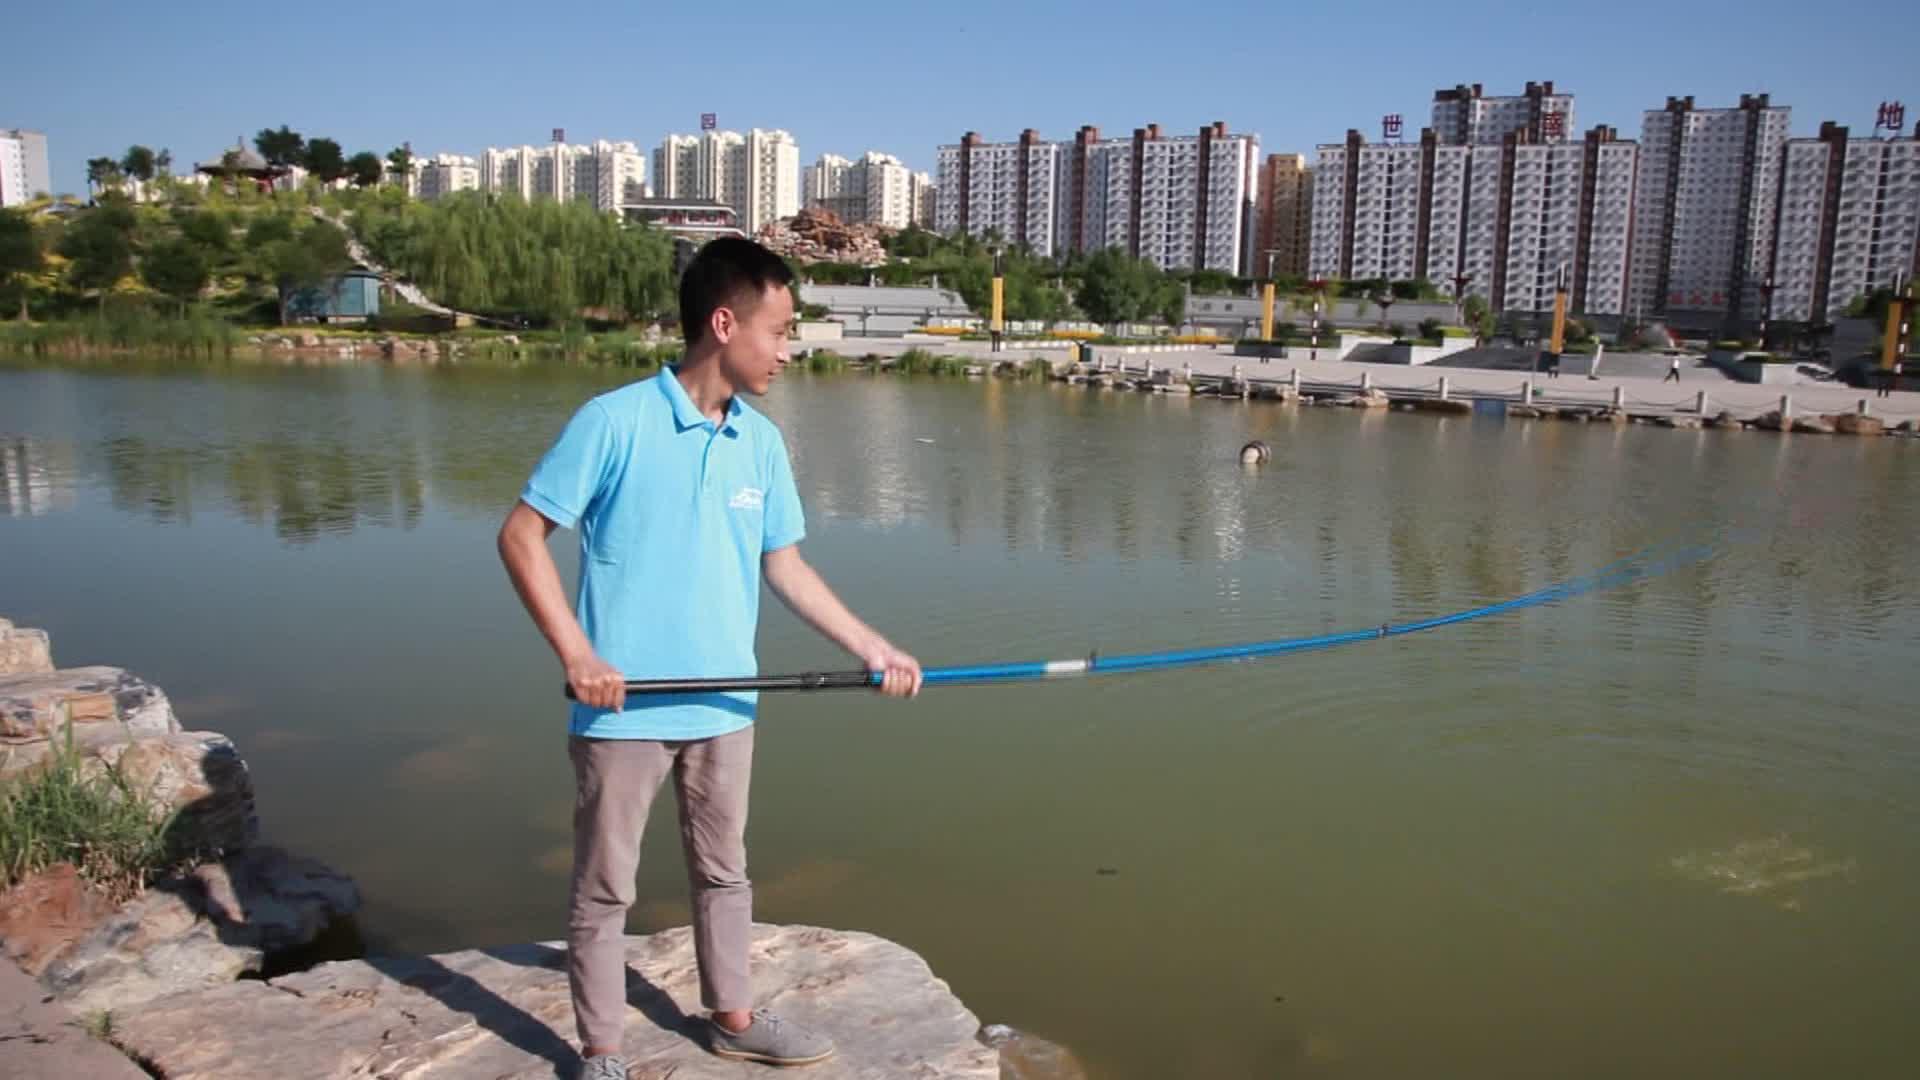 3m/4 m/5 m/6 m/7 m/8 m/9 m pas cher en fibre de verre télescopique la canne à pêche